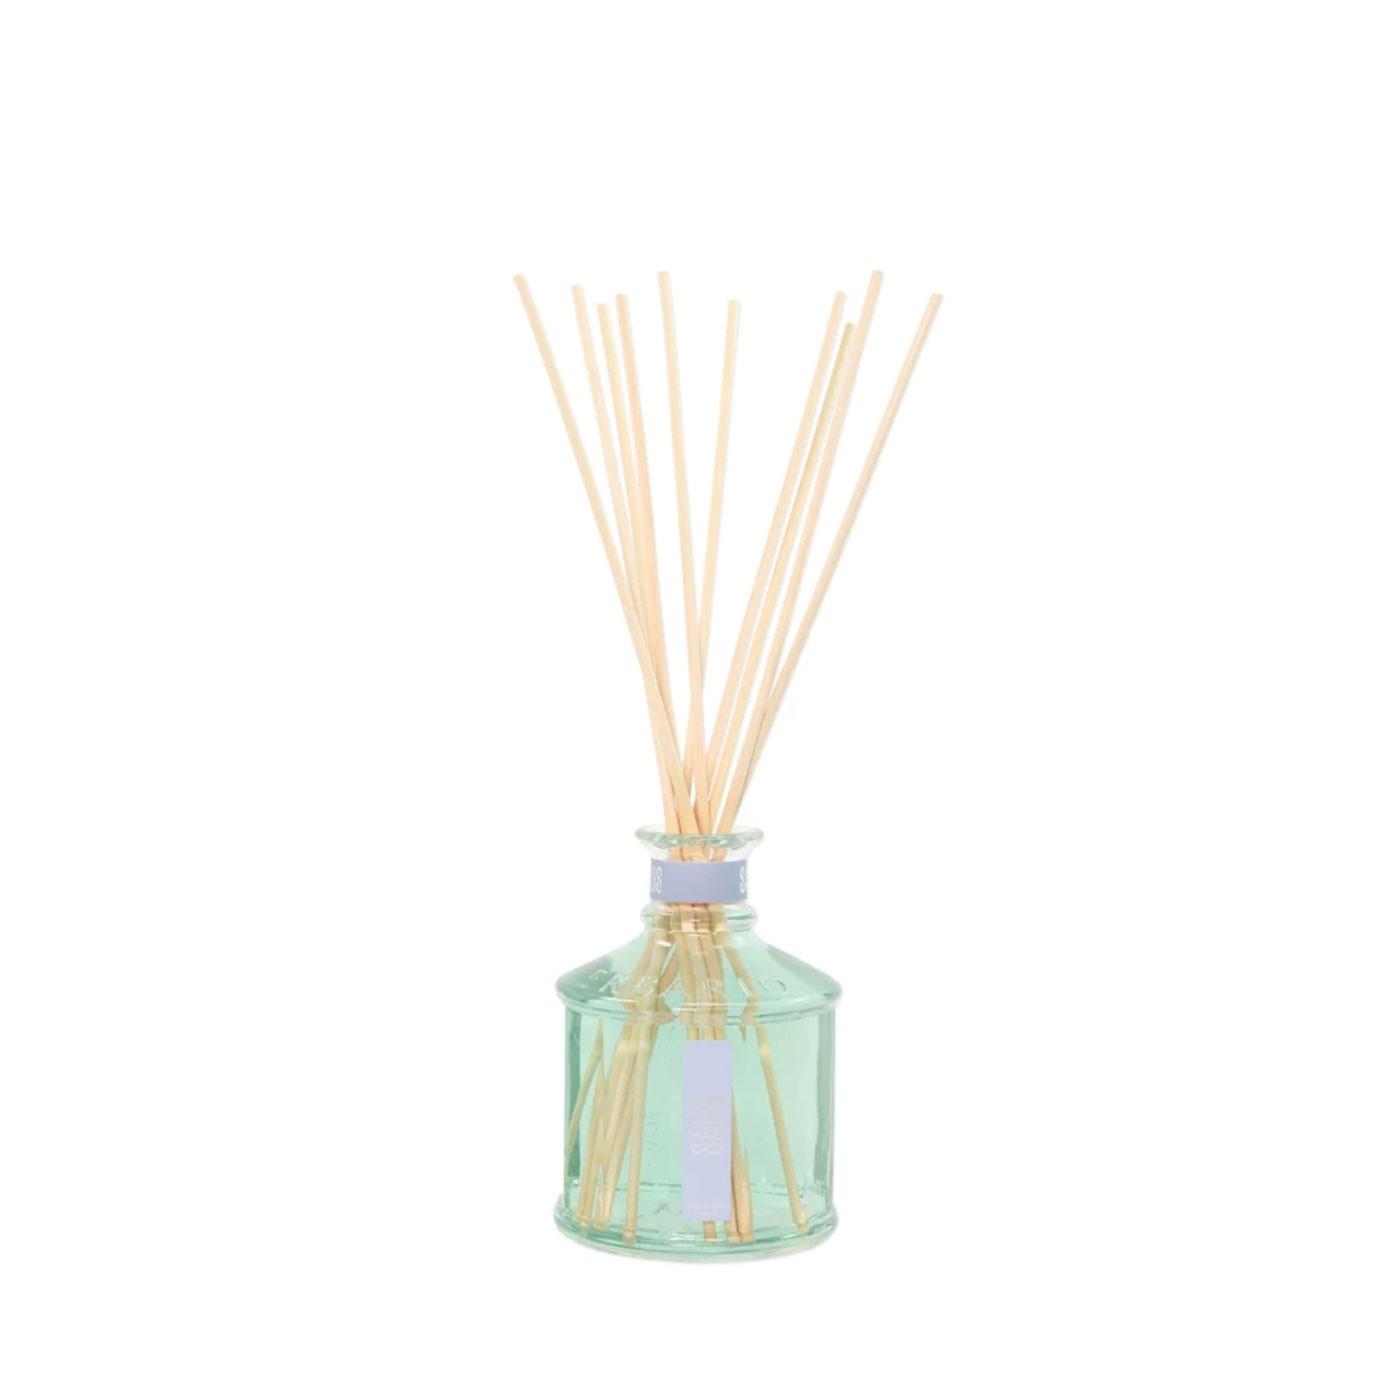 Salis Fragrance Diffuser 3.4 oz - Erbario Toscano | Eataly.com